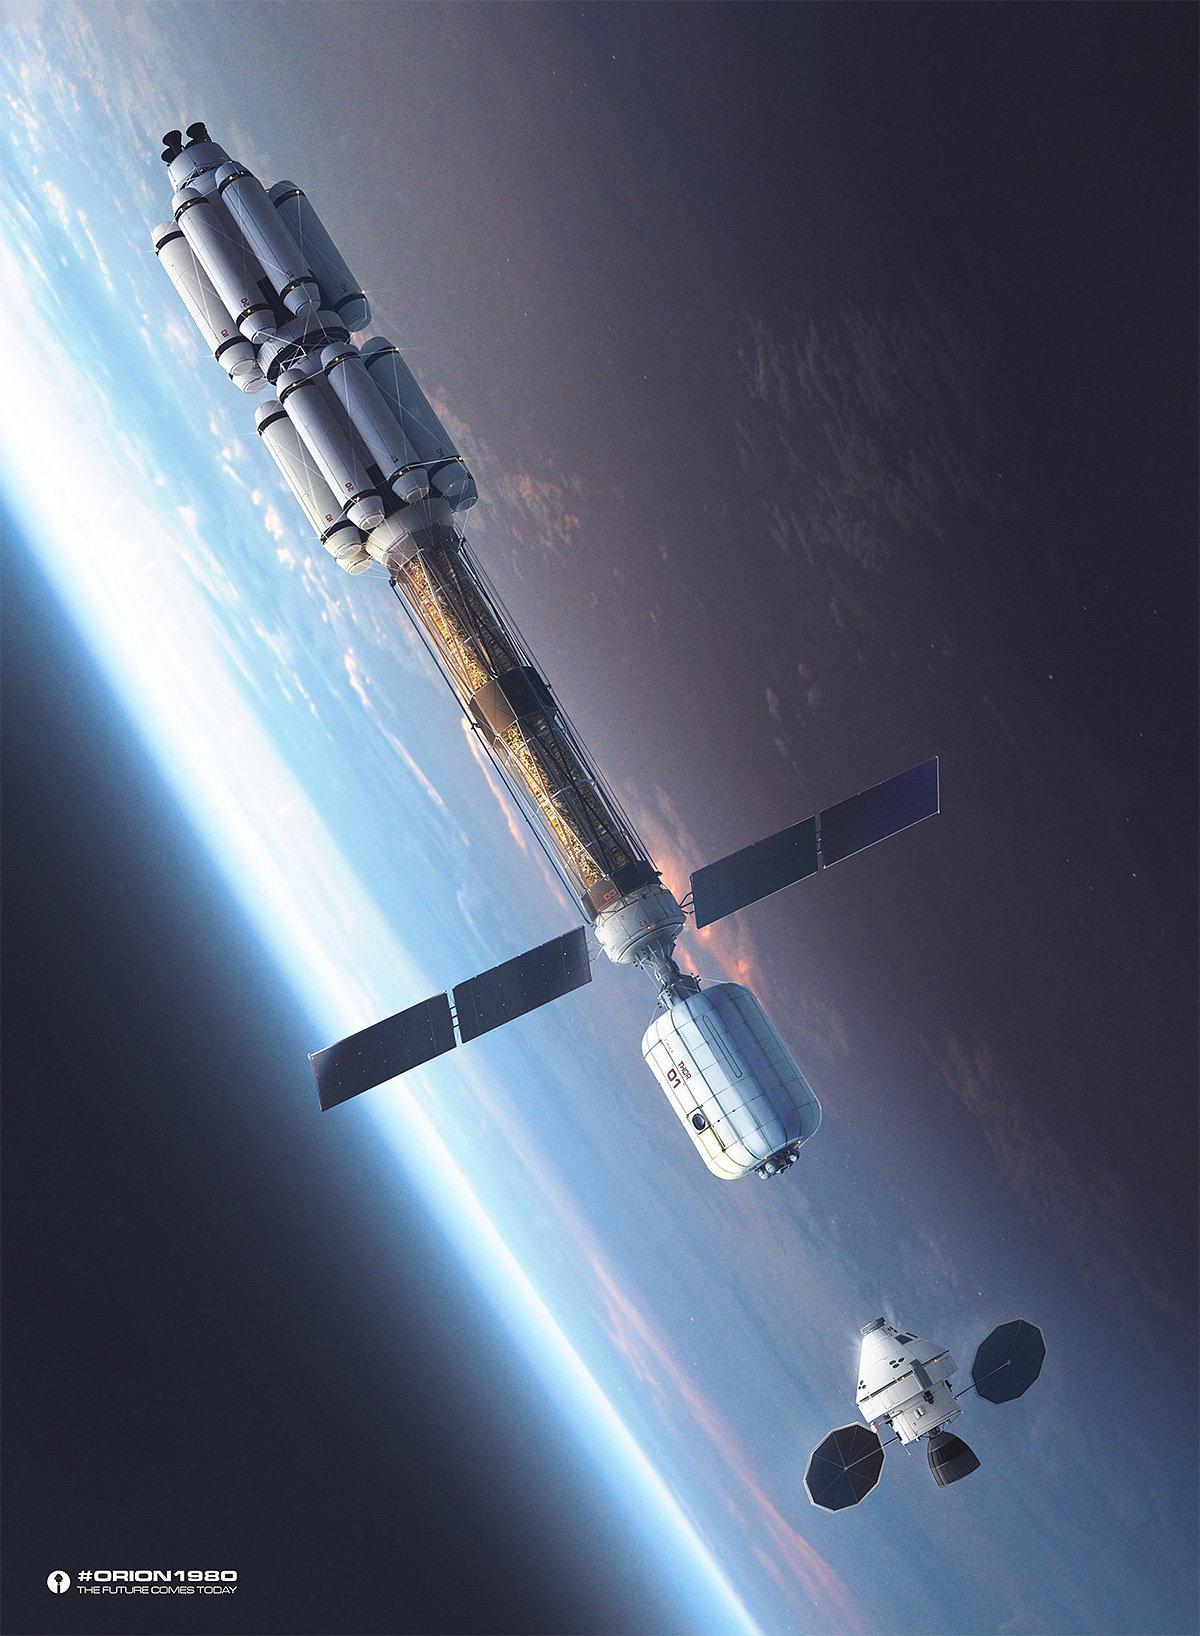 [ART] Space That Never Was Mac-rebisz-20141216-orion1980-1200